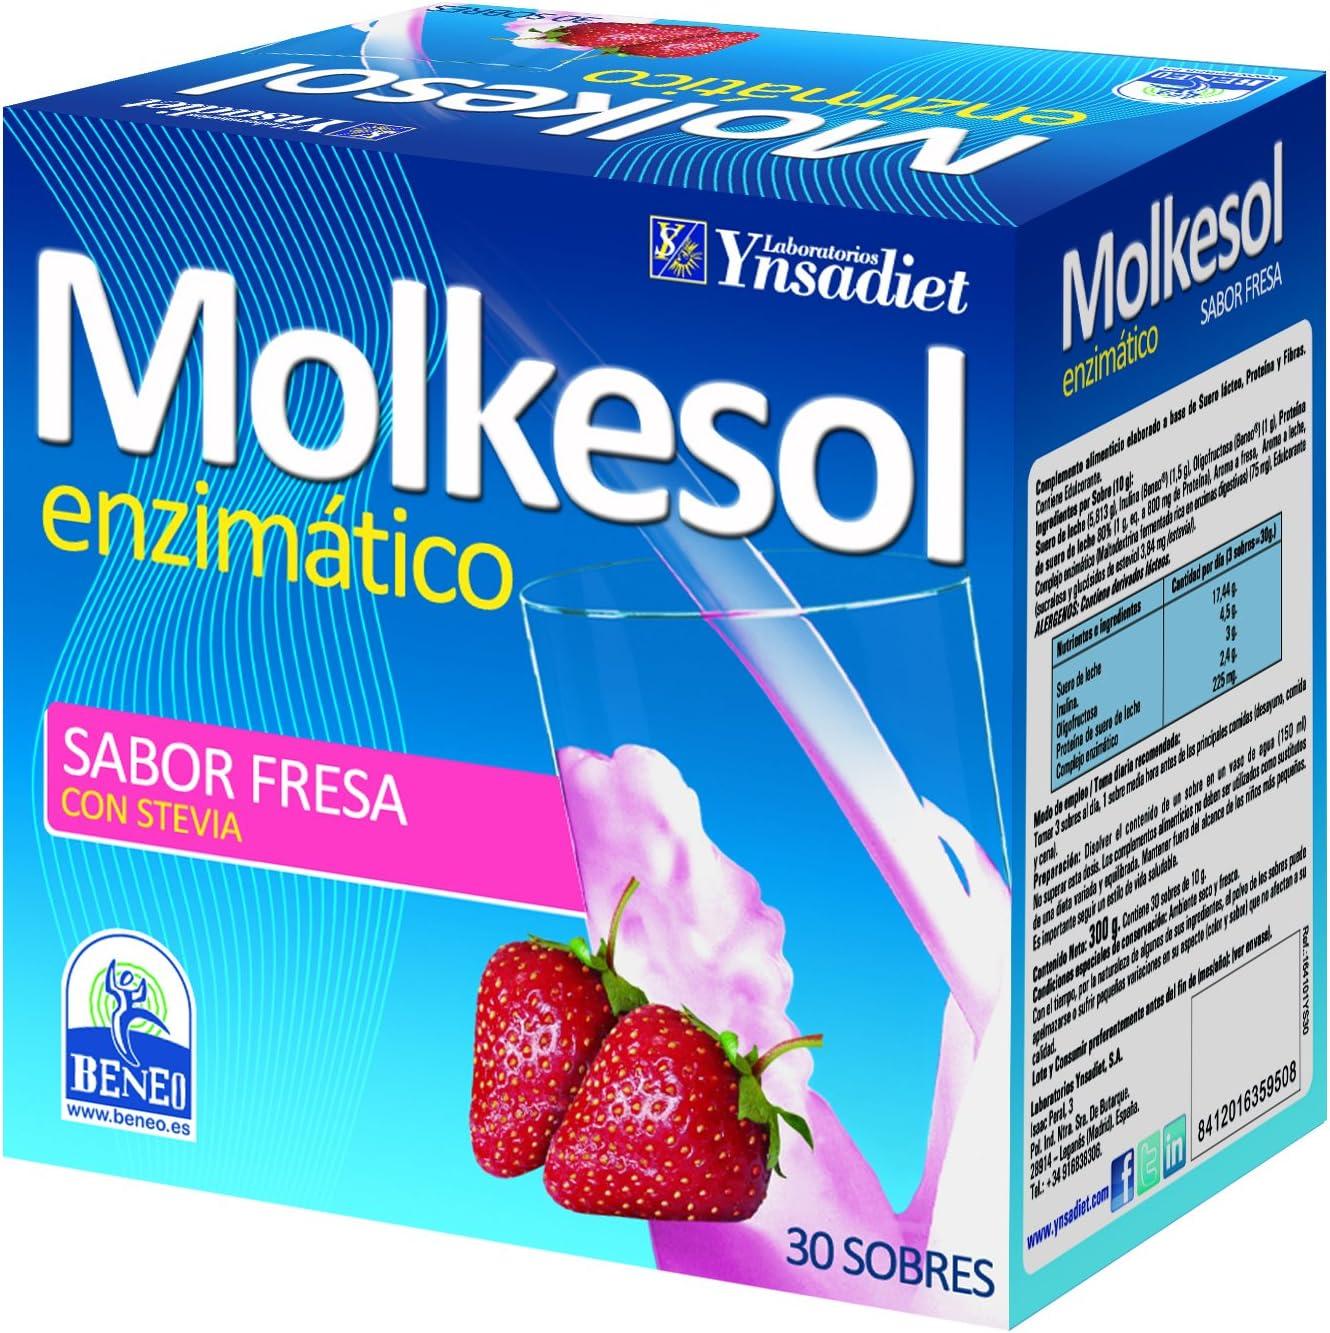 YNSADIET Molkesol Fresa Enzimático con Stevia - 30 Sobres